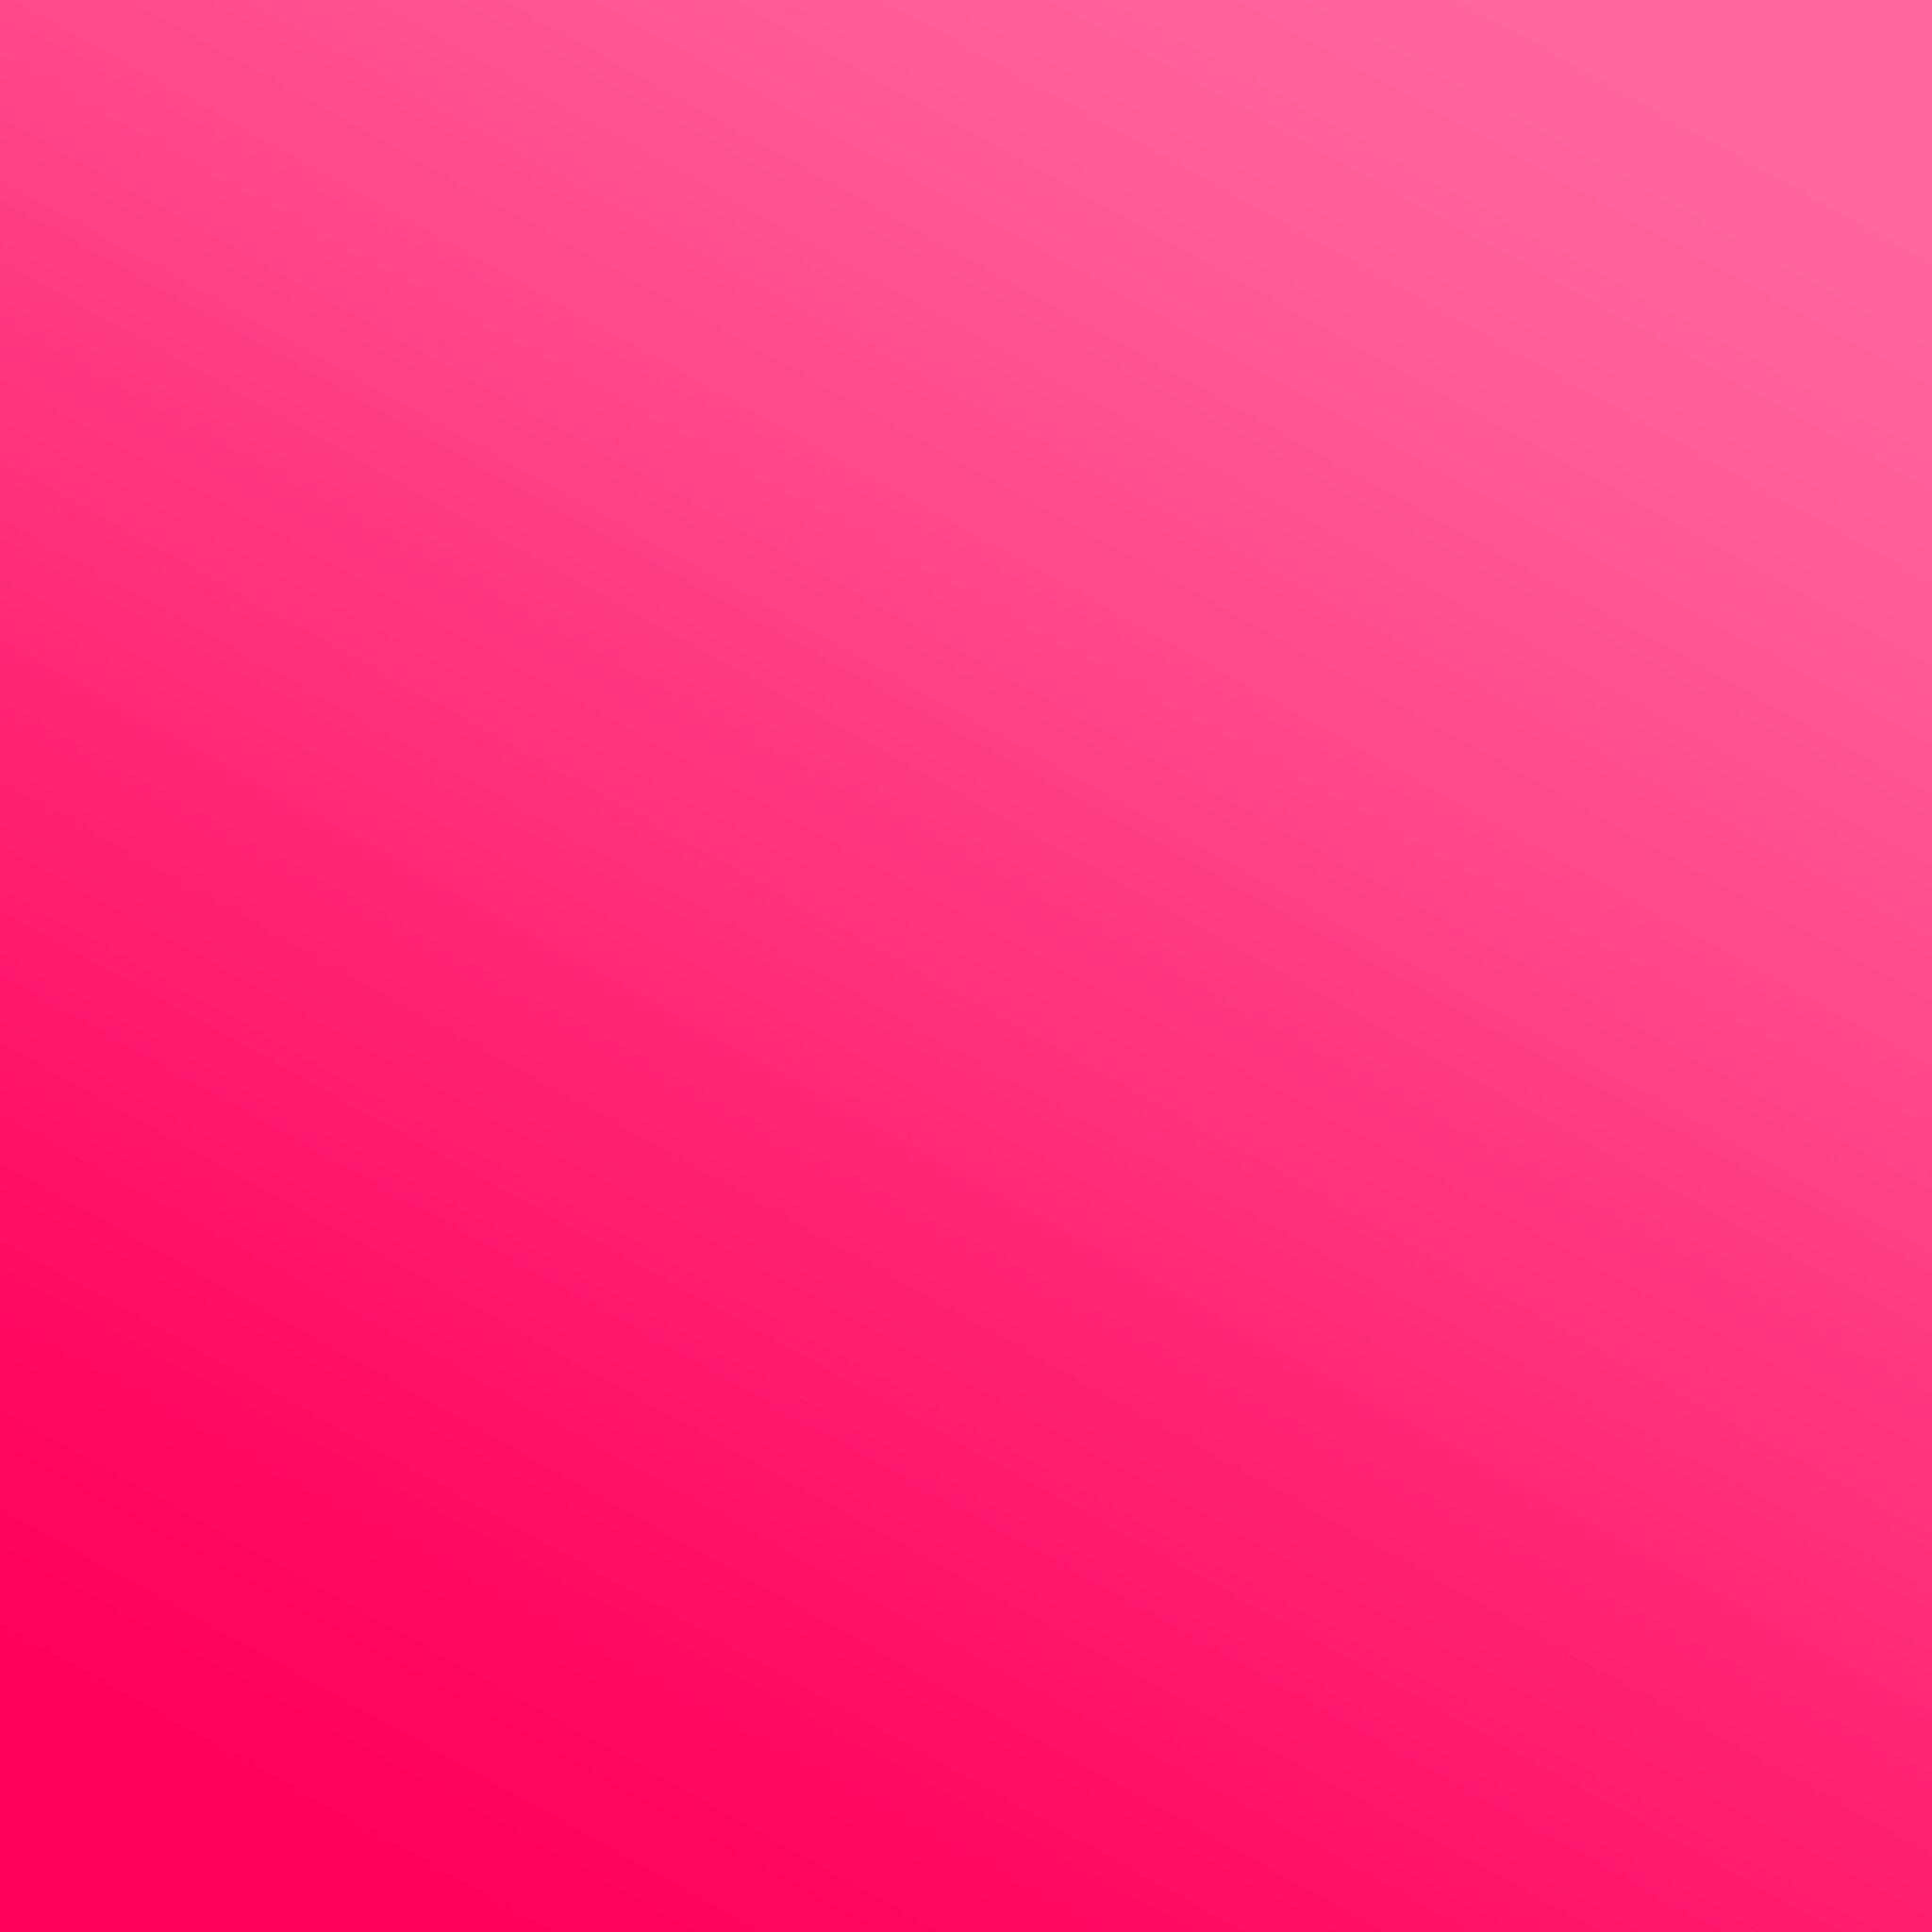 2048x2048 Wallpaper pink, solid, color, light, bright | Apple iPad ...